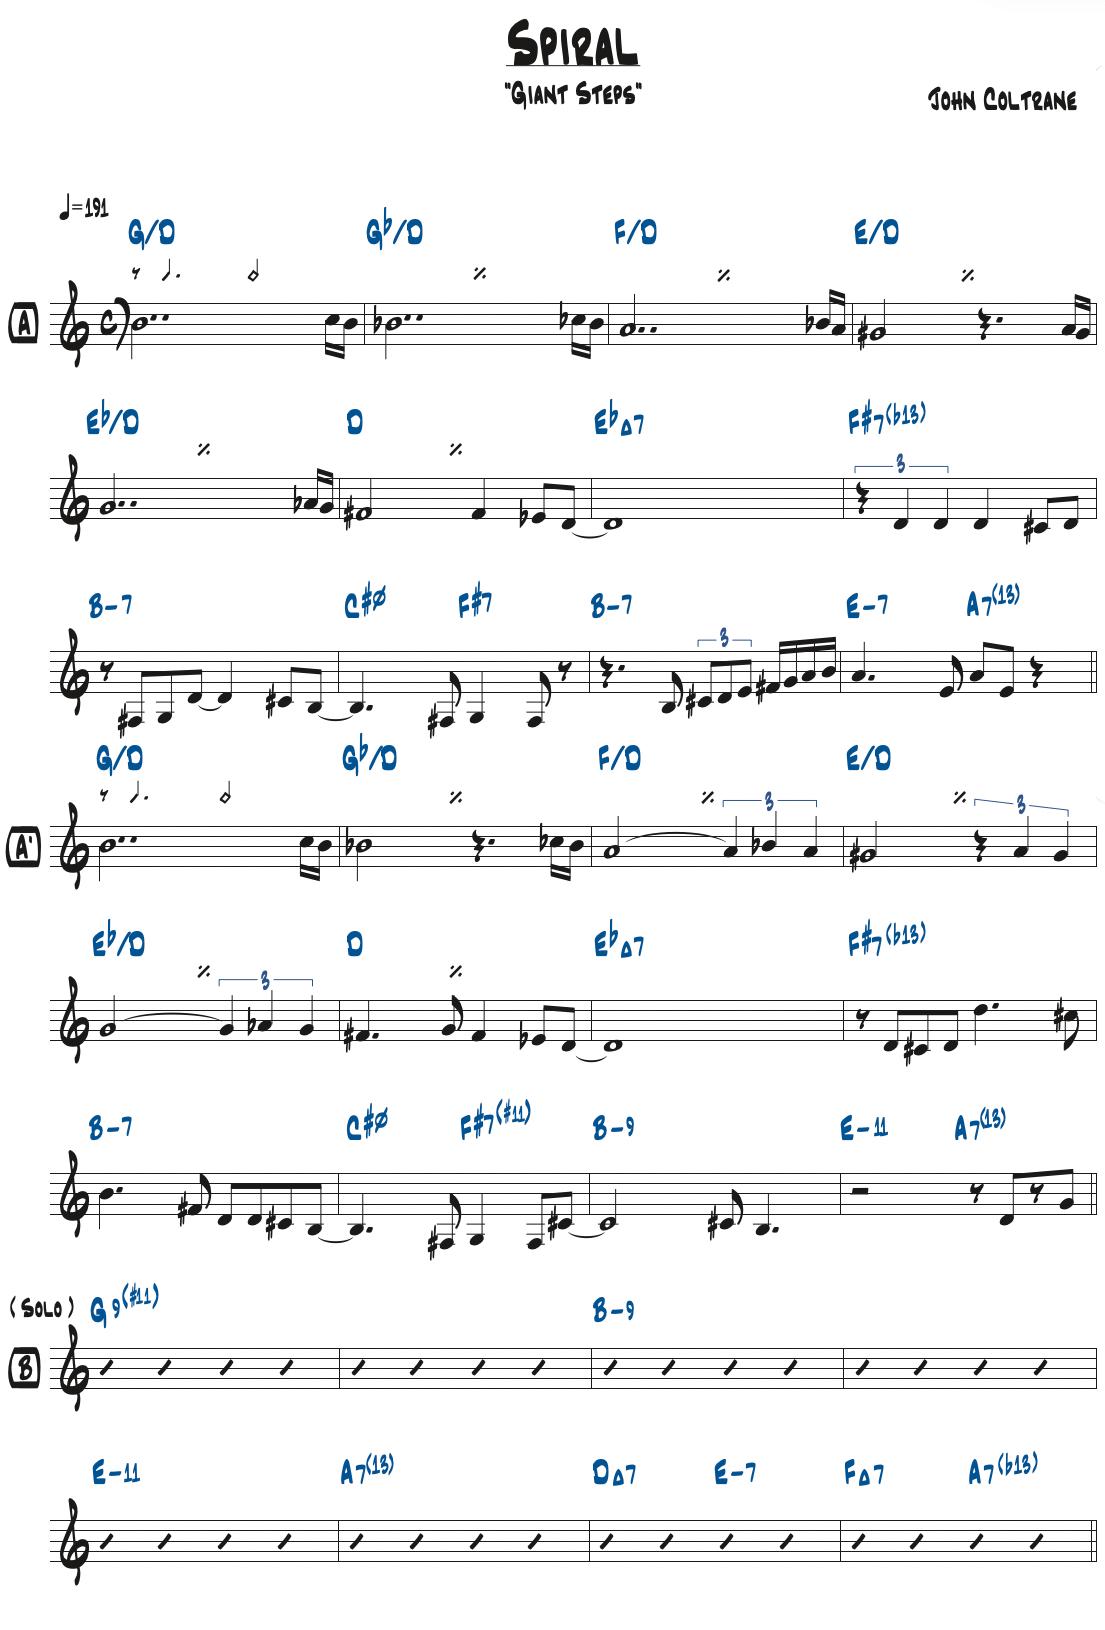 John Coltrane作曲『Spiral』のリードシート